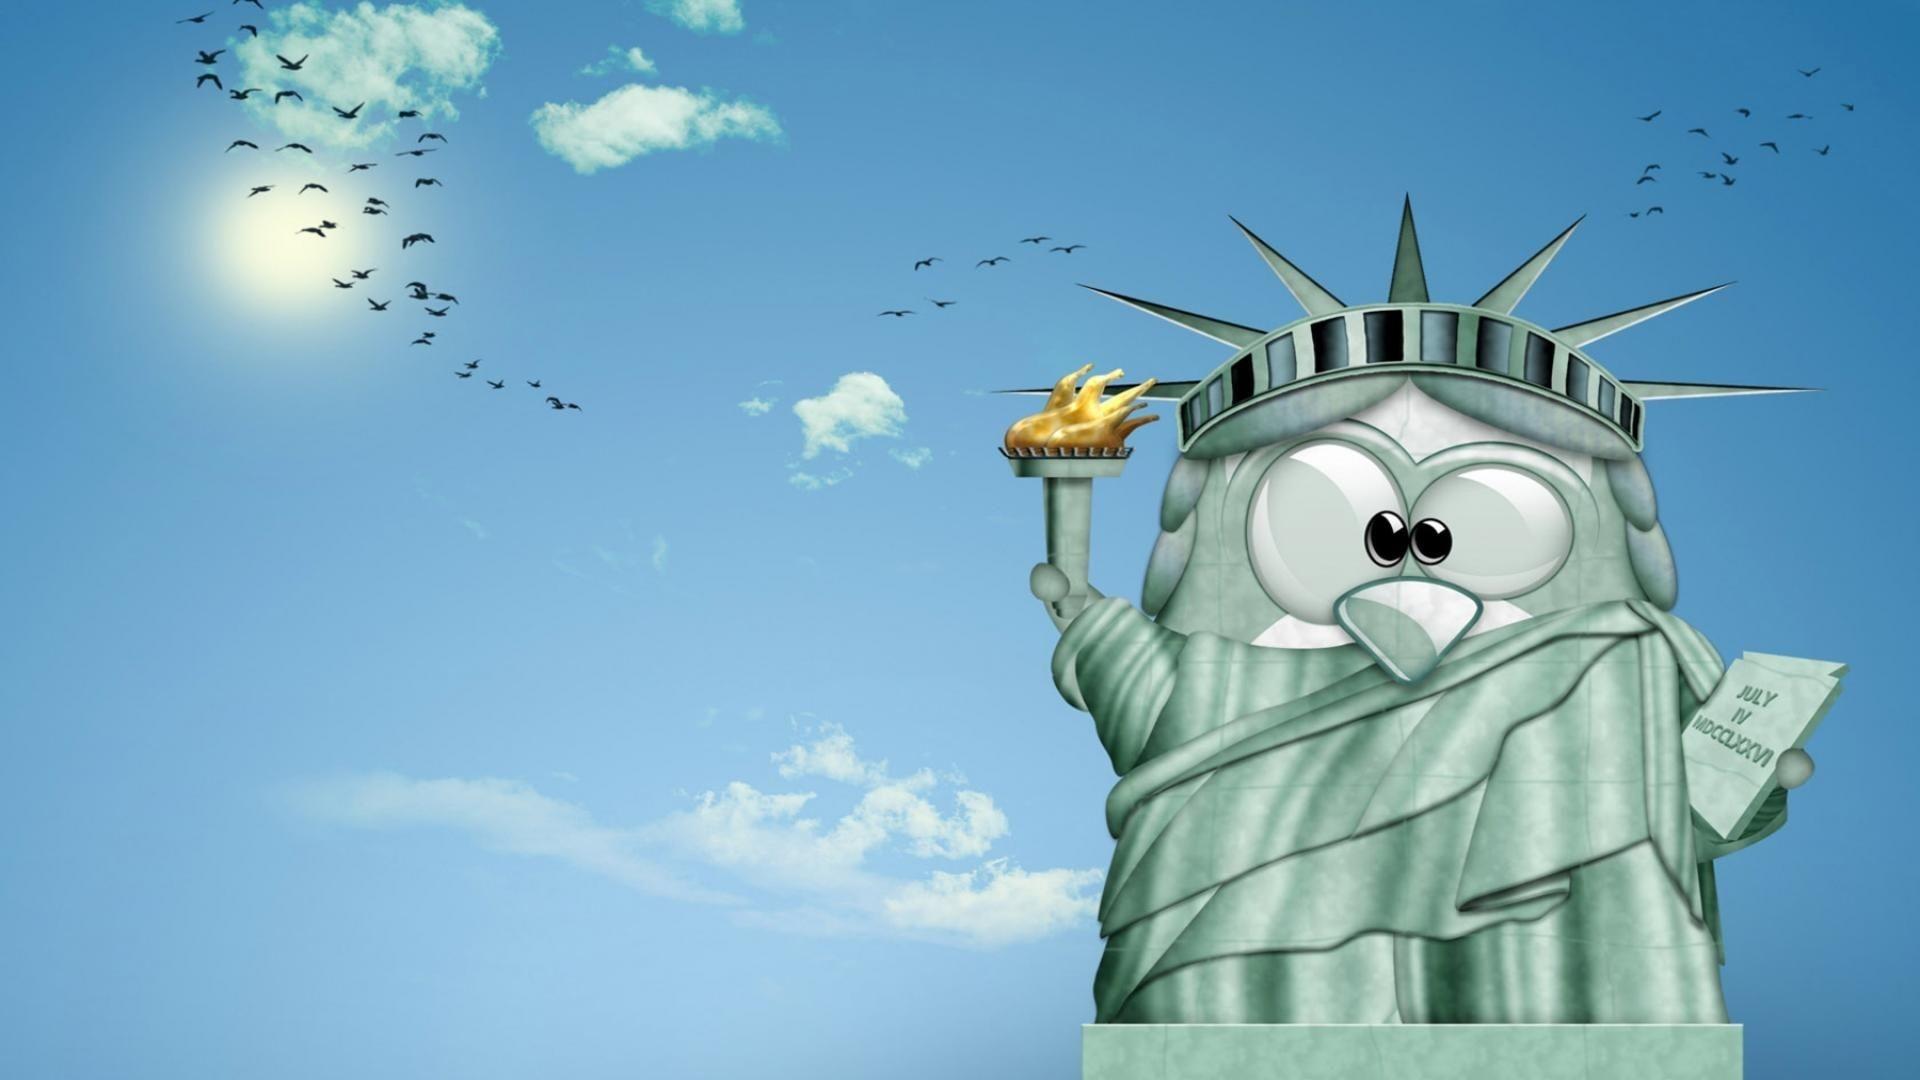 Res: 1920x1080, Funny Cartoon Wallpaper images free download 1920×1080 Funny Cartoon Images  Wallpapers (53 Wallpapers